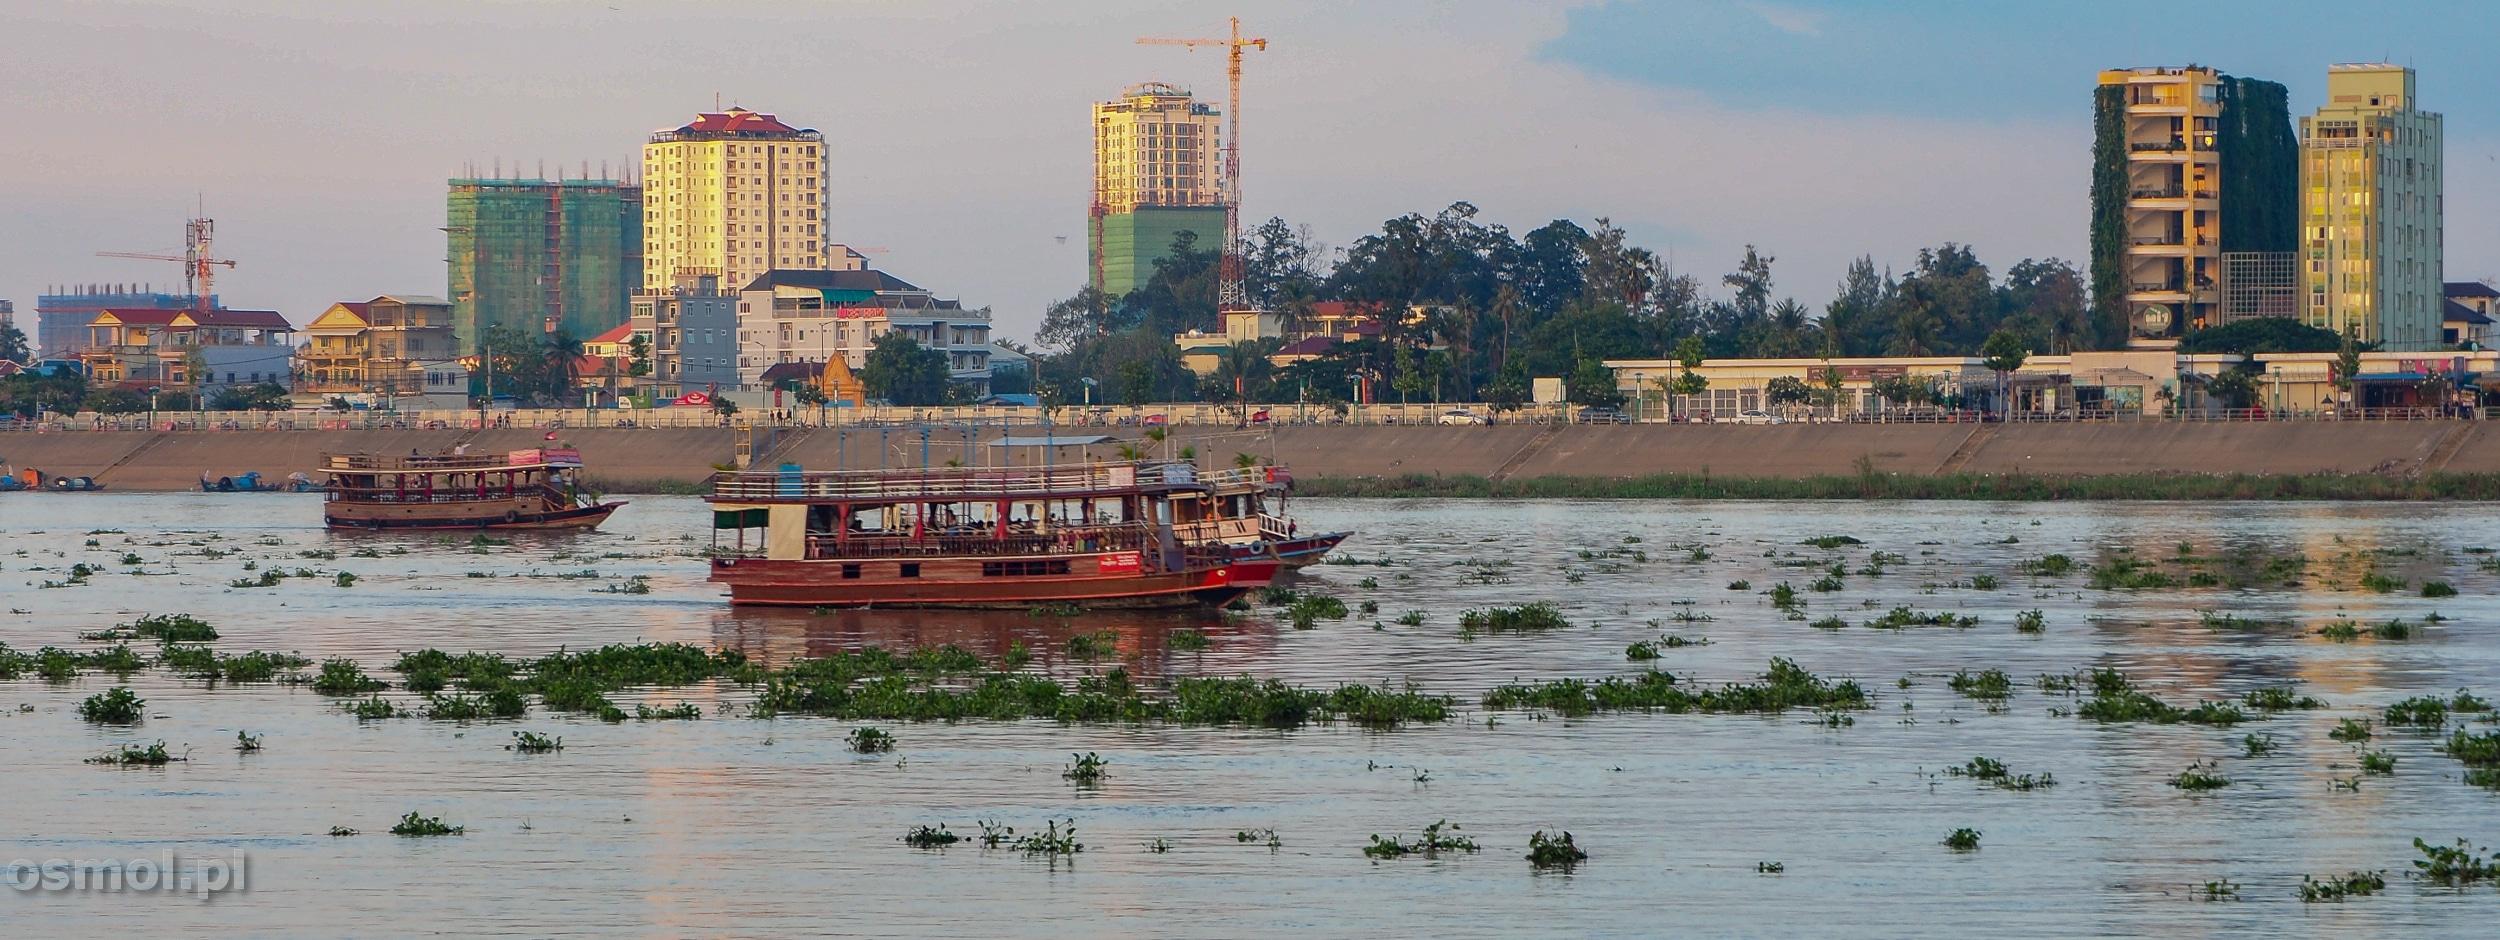 Mekong w Phnom Penh